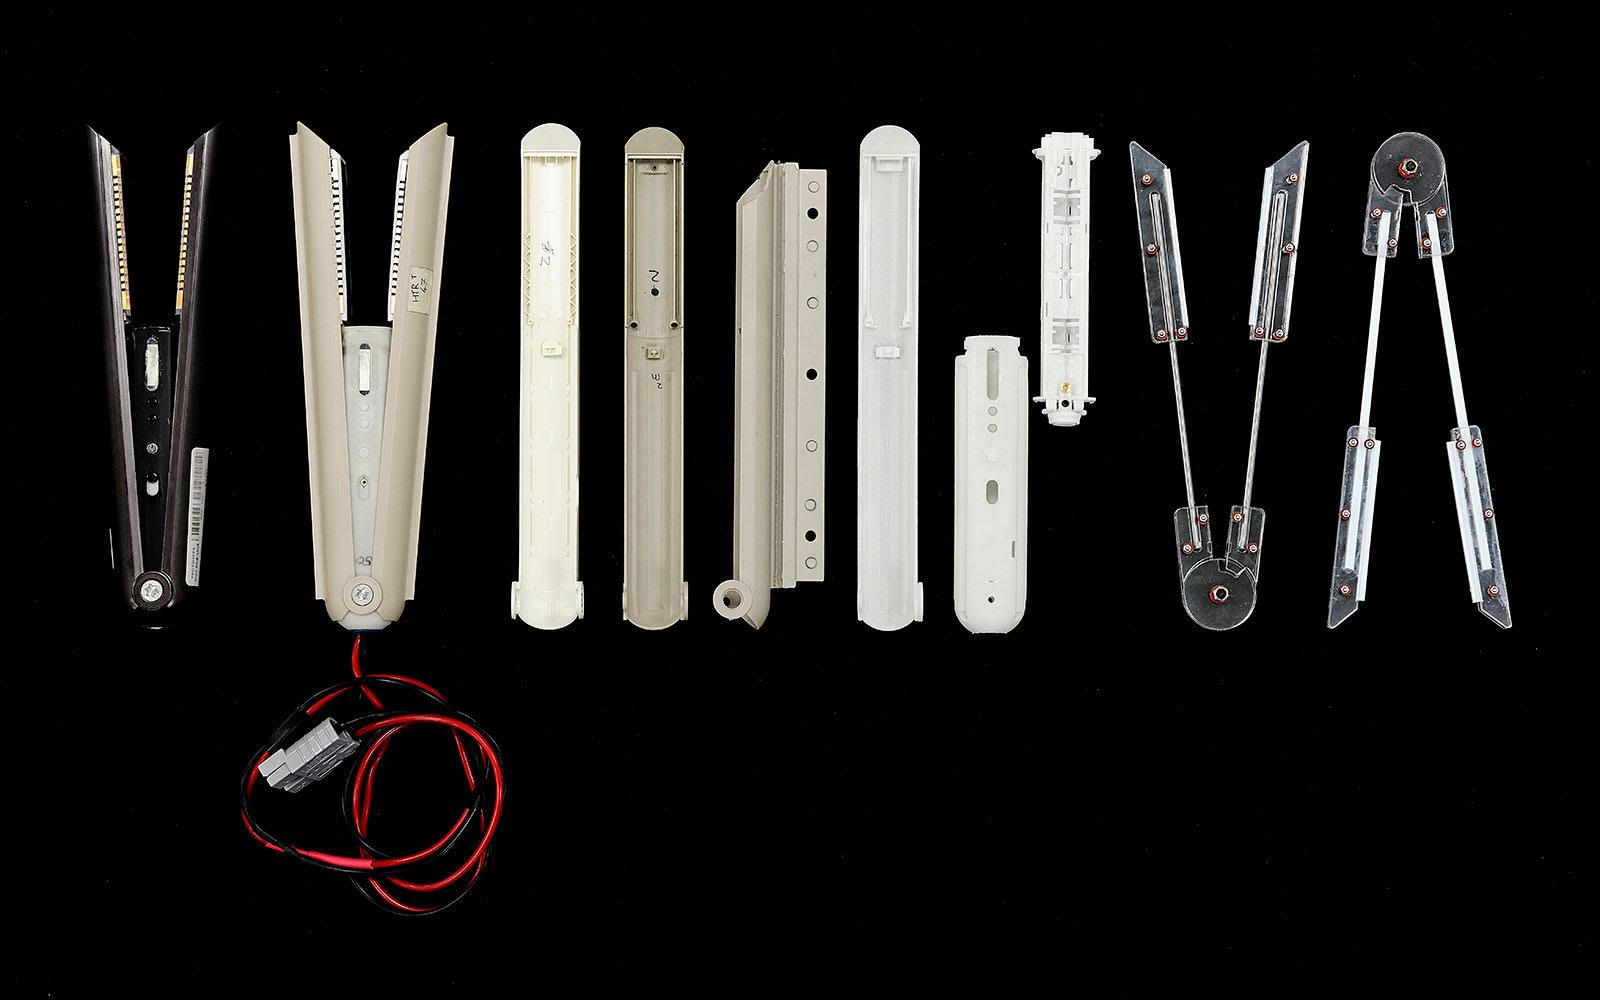 Dyson Corrale prototypes